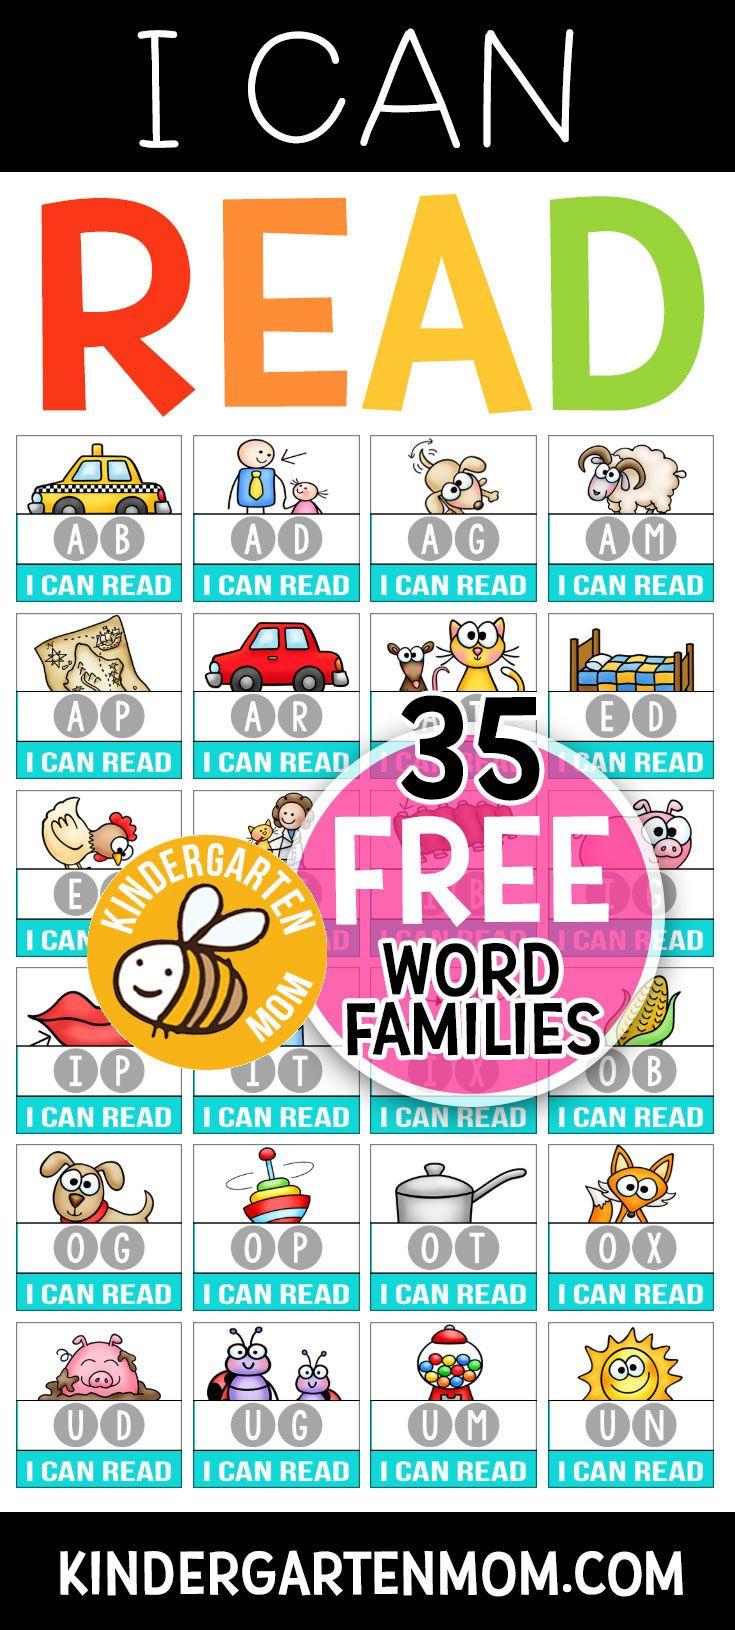 Pinvalerie Mcclintick On Homeschool Ninjas | Kindergarten - Free Printable Word Family Mini Books